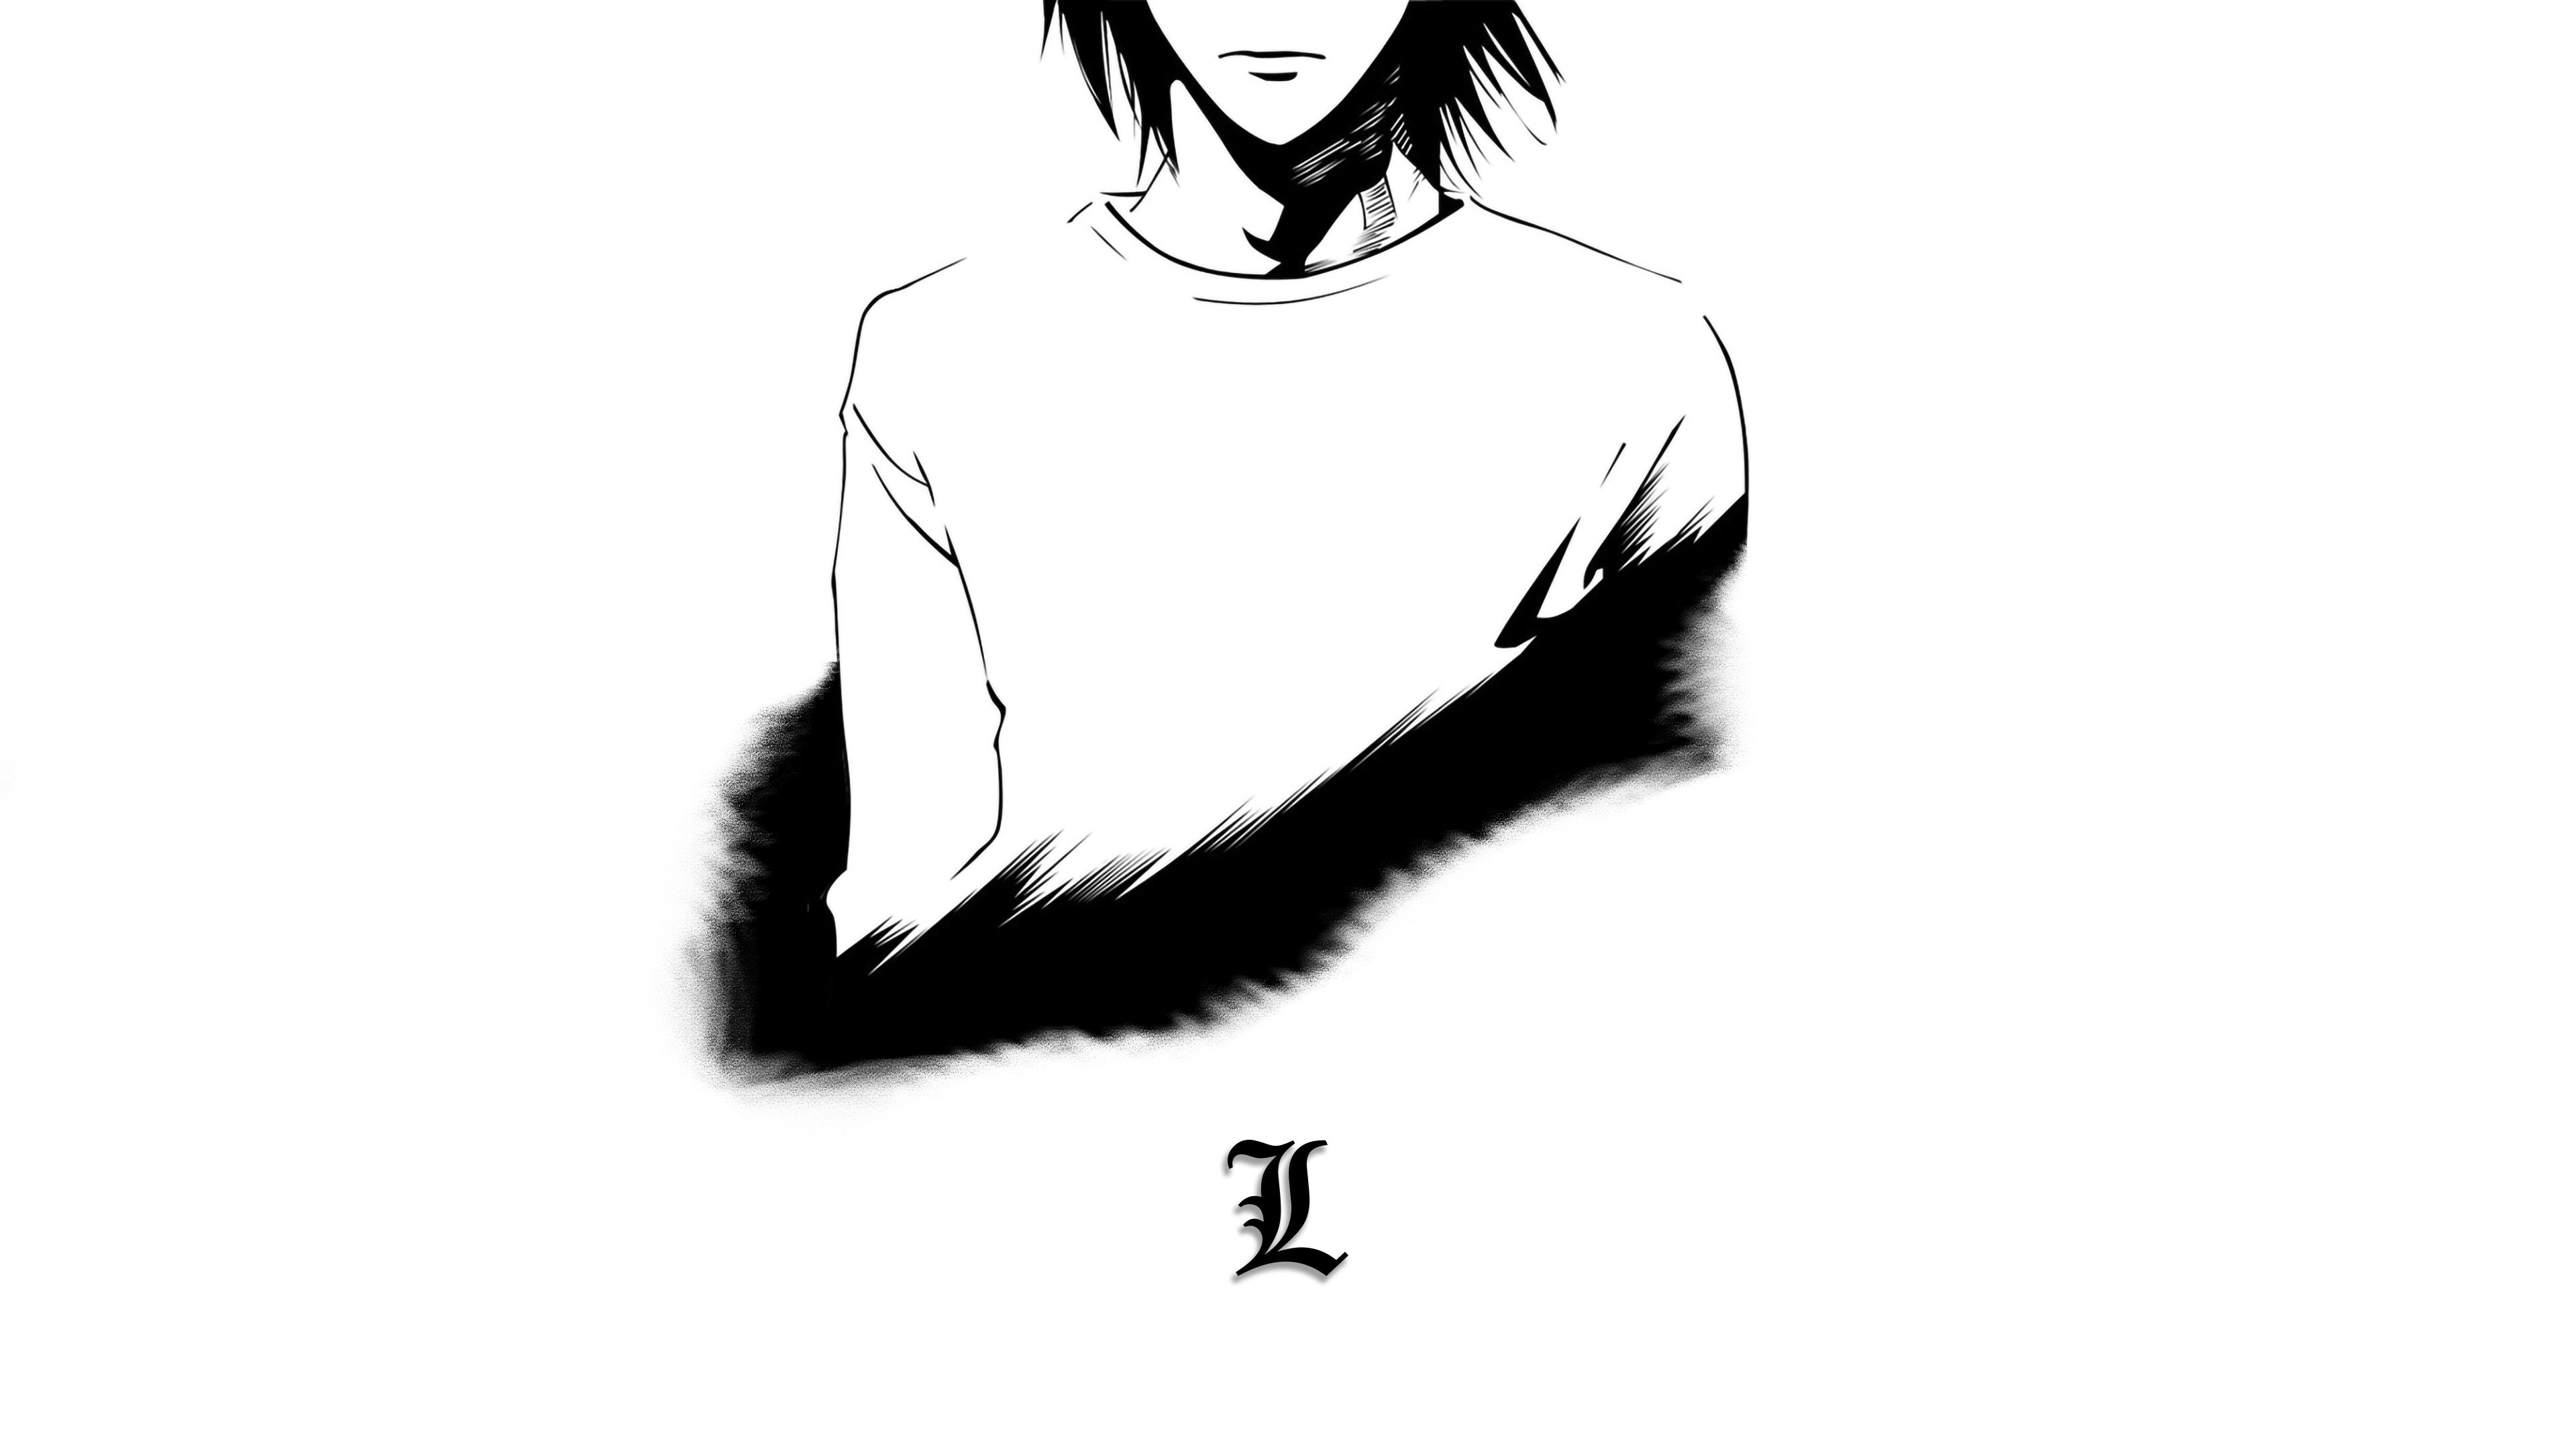 Anime 3840x2160 Lawliet L Death Note Yagami Light minimalism